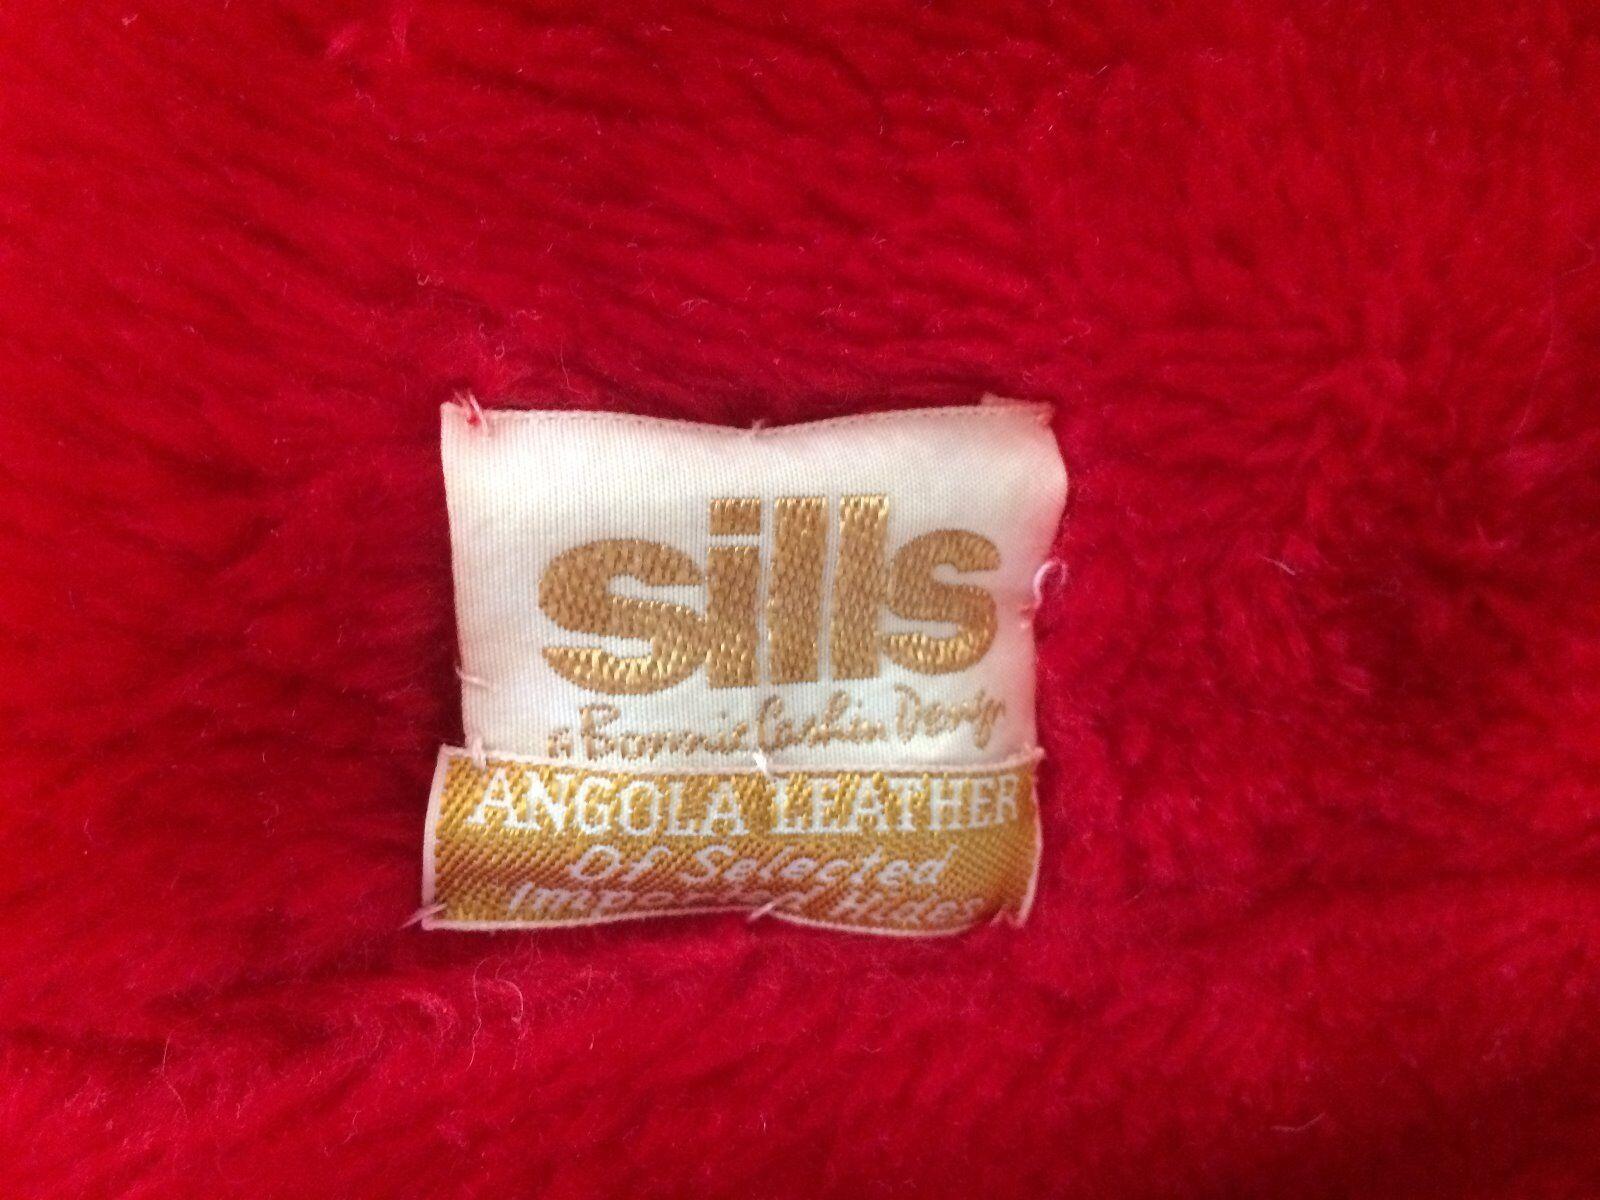 Vintage Bonnie Cashin for Sills red Angola leathe… - image 9